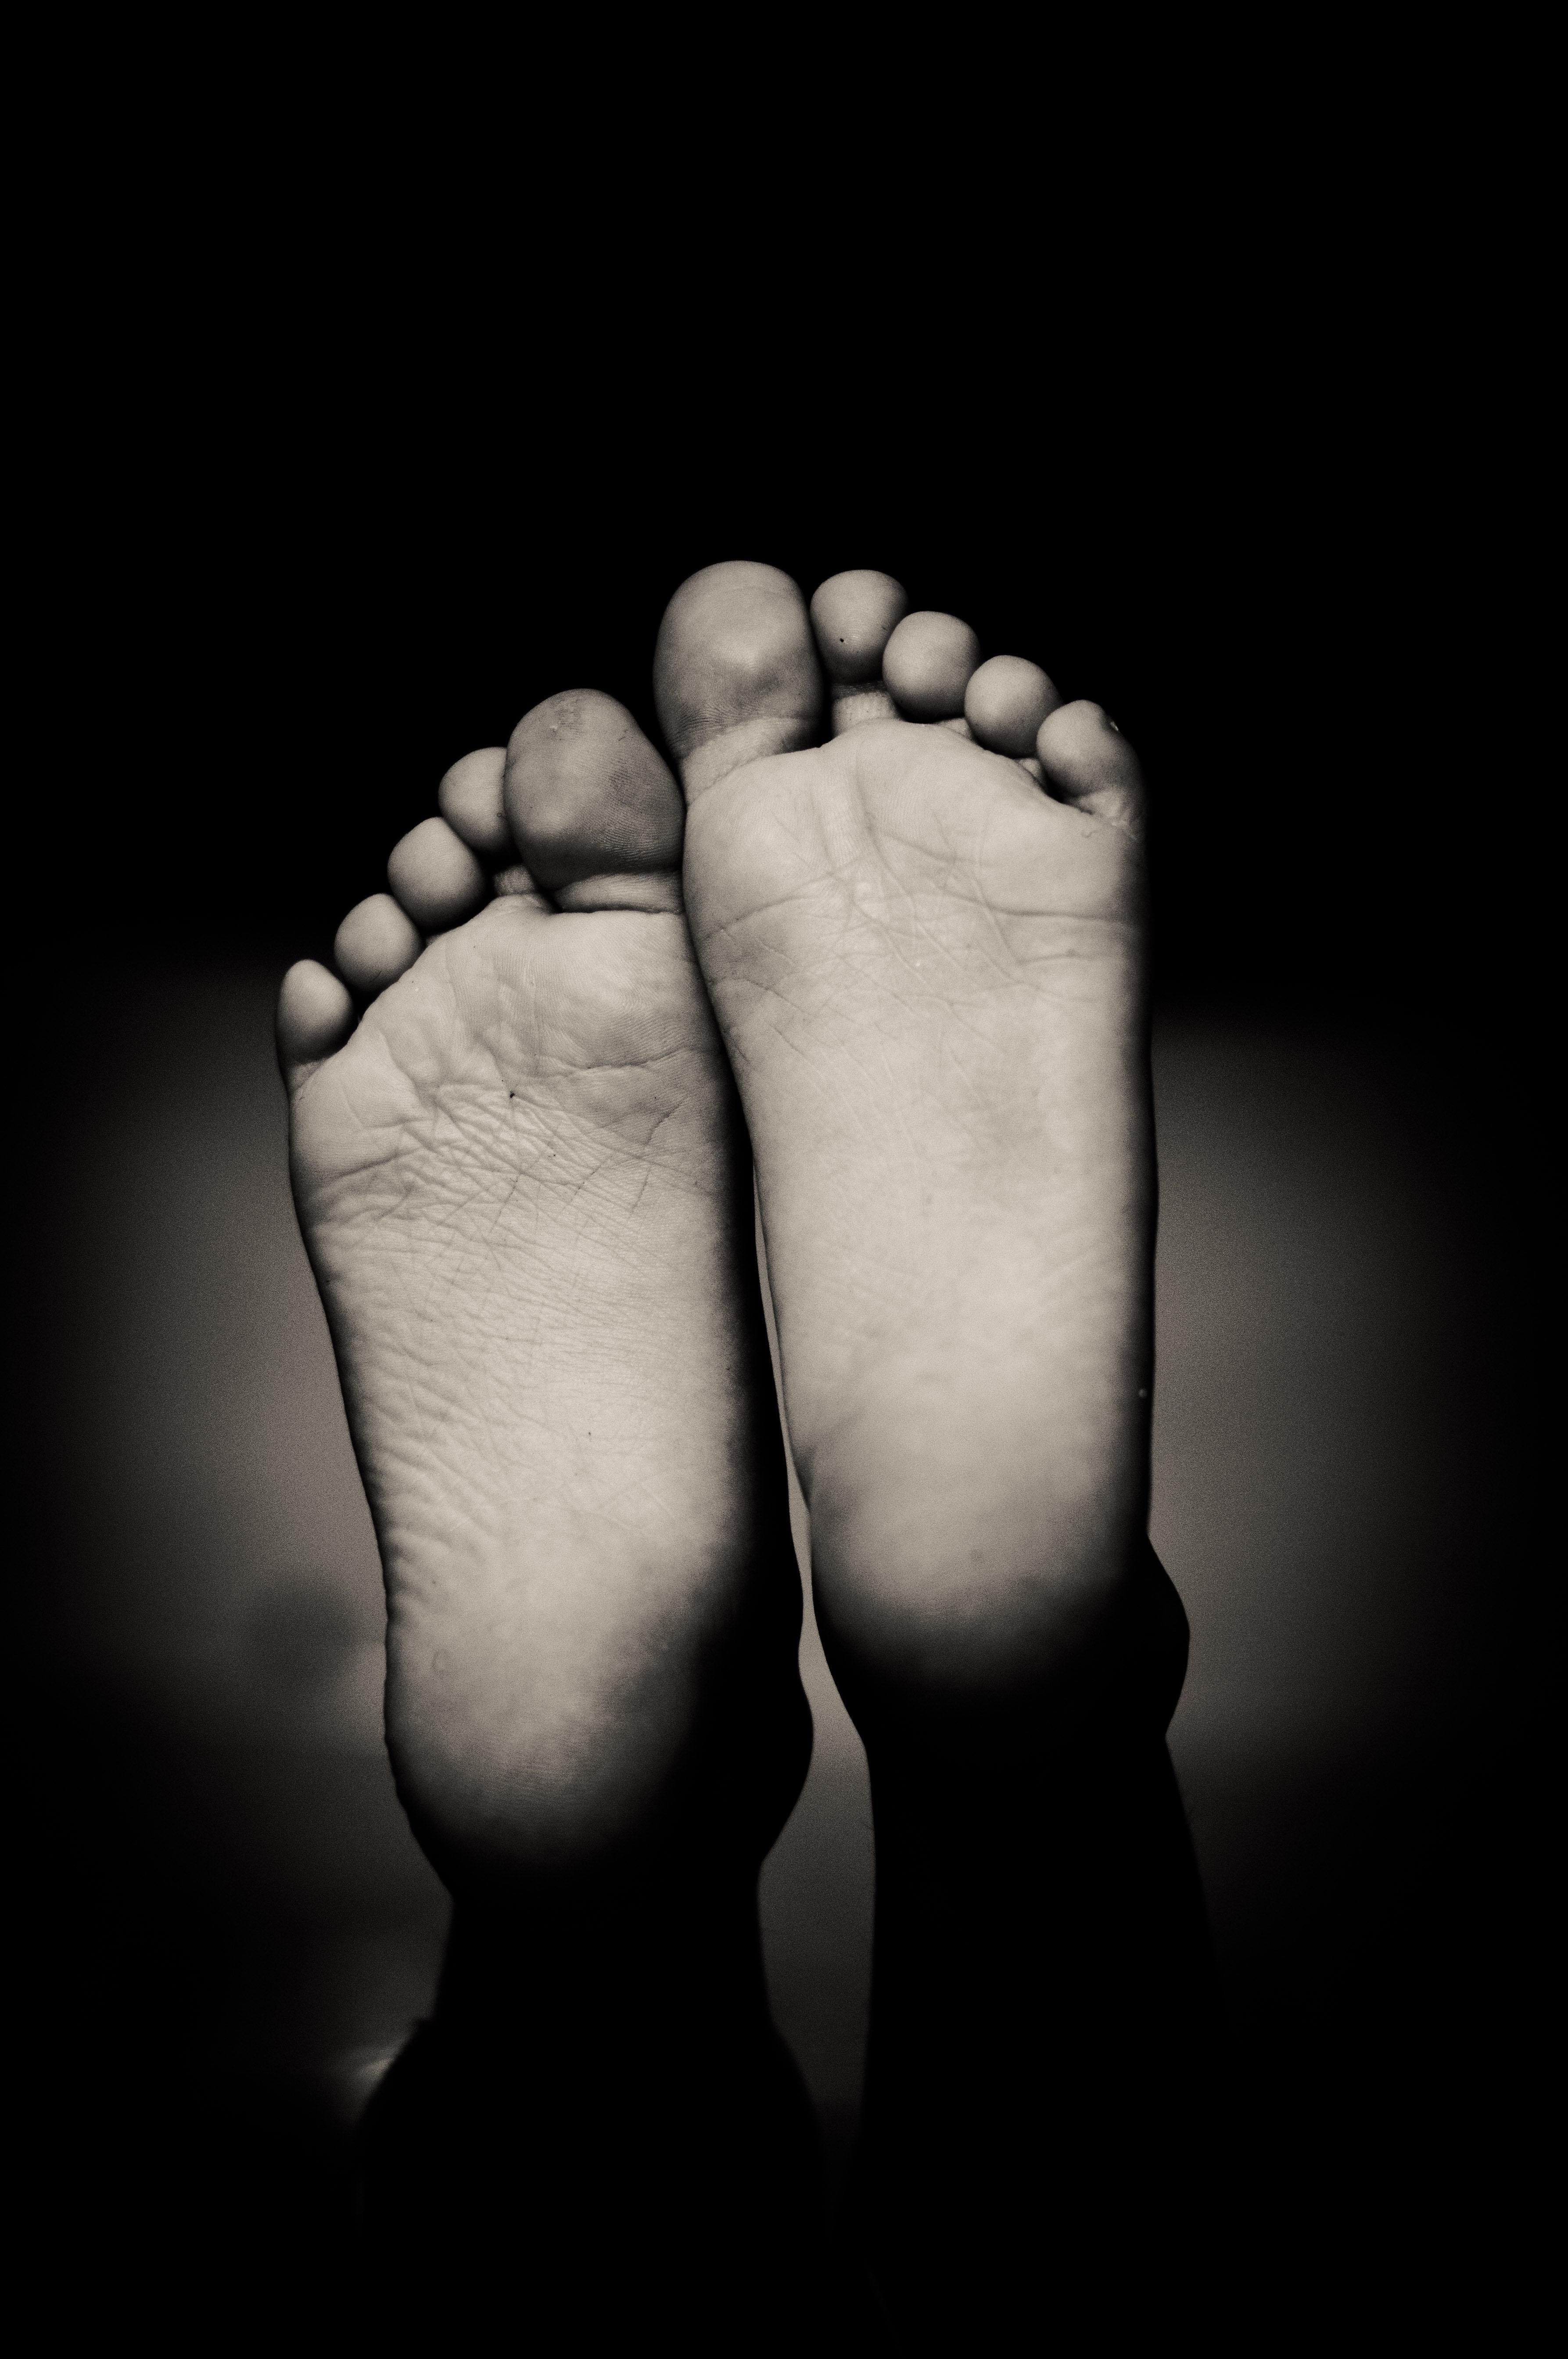 Feet - Feet